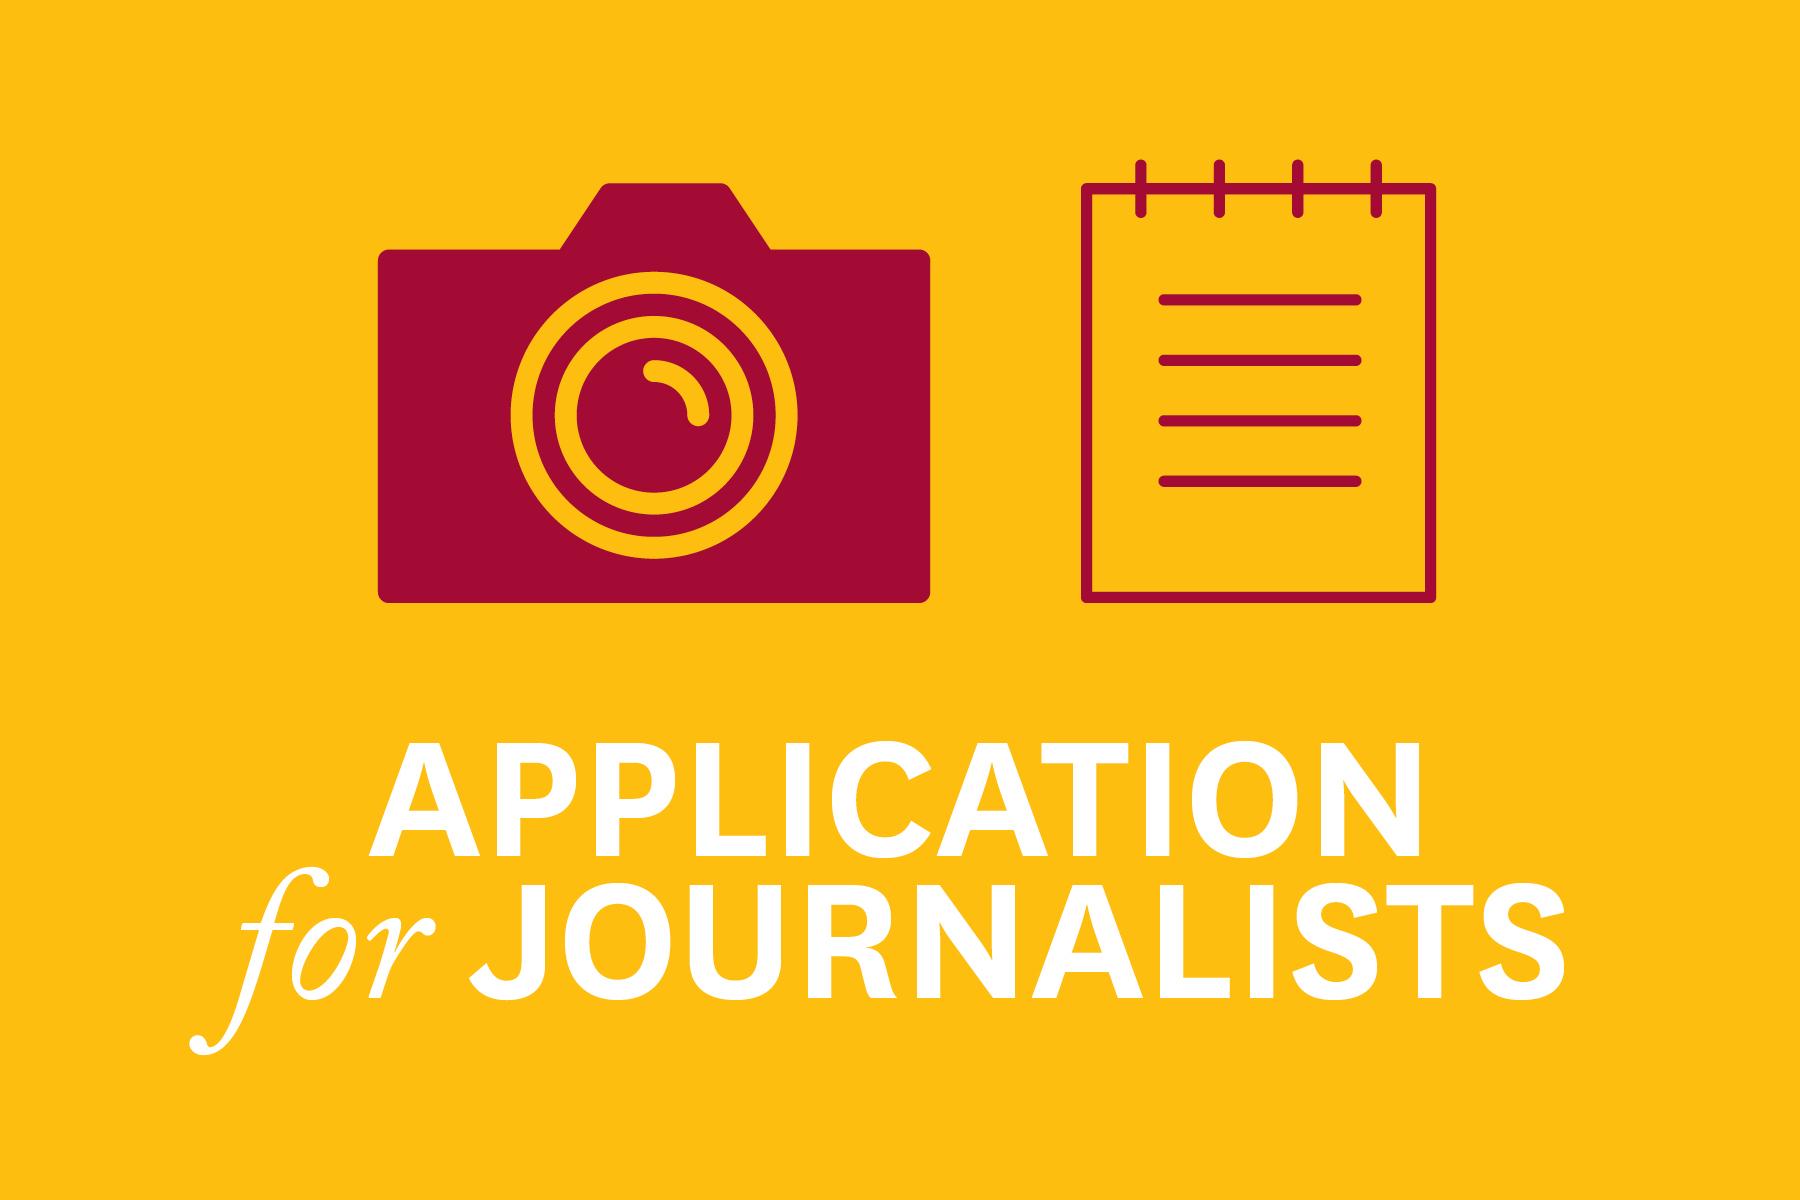 USC Spiritual Exemplars Project – International Religion Reporting Program for Journalists 2019